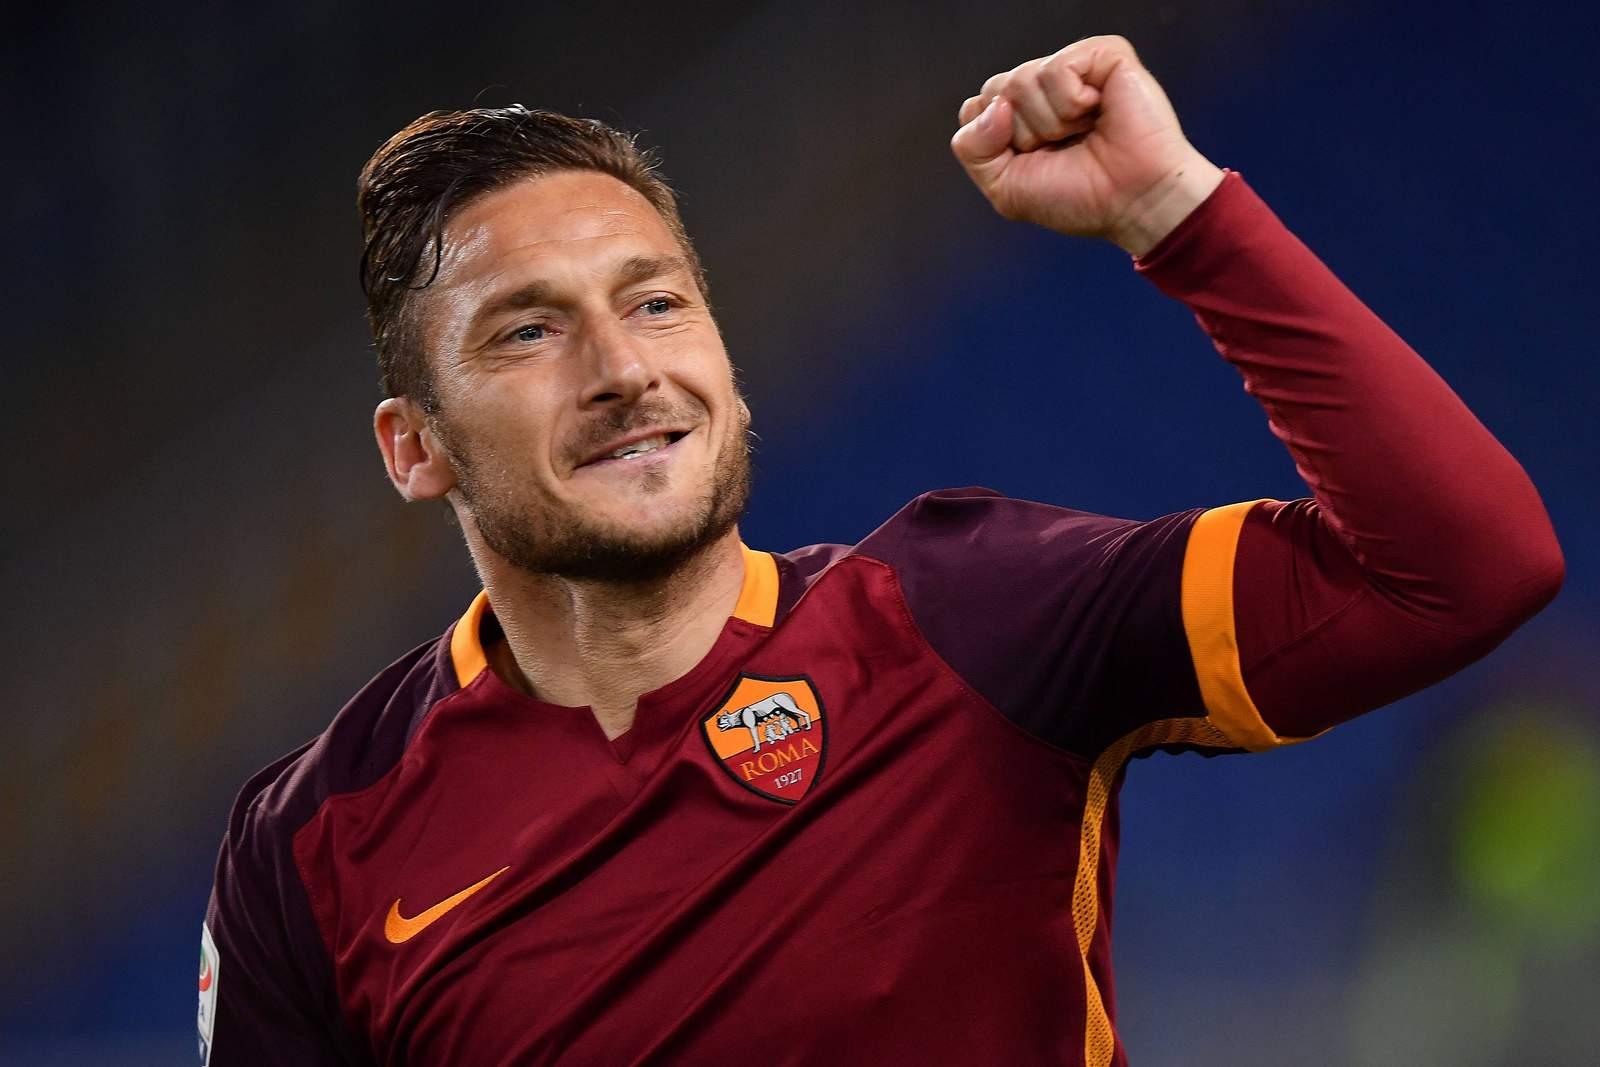 Jubelt Totti wieder? Unser Tipp: Porto gewinnt gegen AS Rom